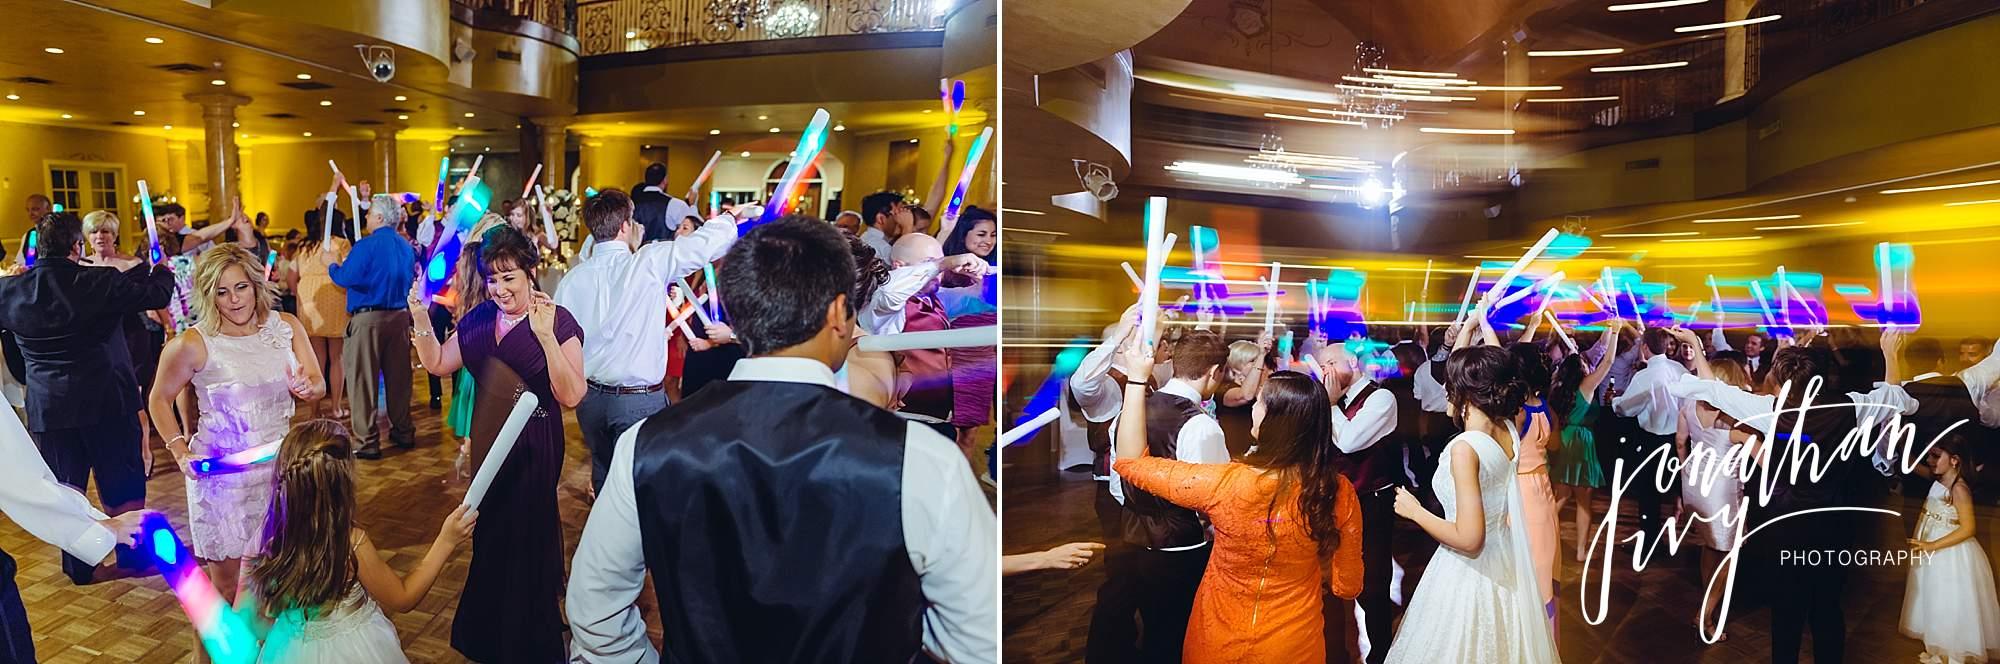 wedding reception dance at chateau polonez